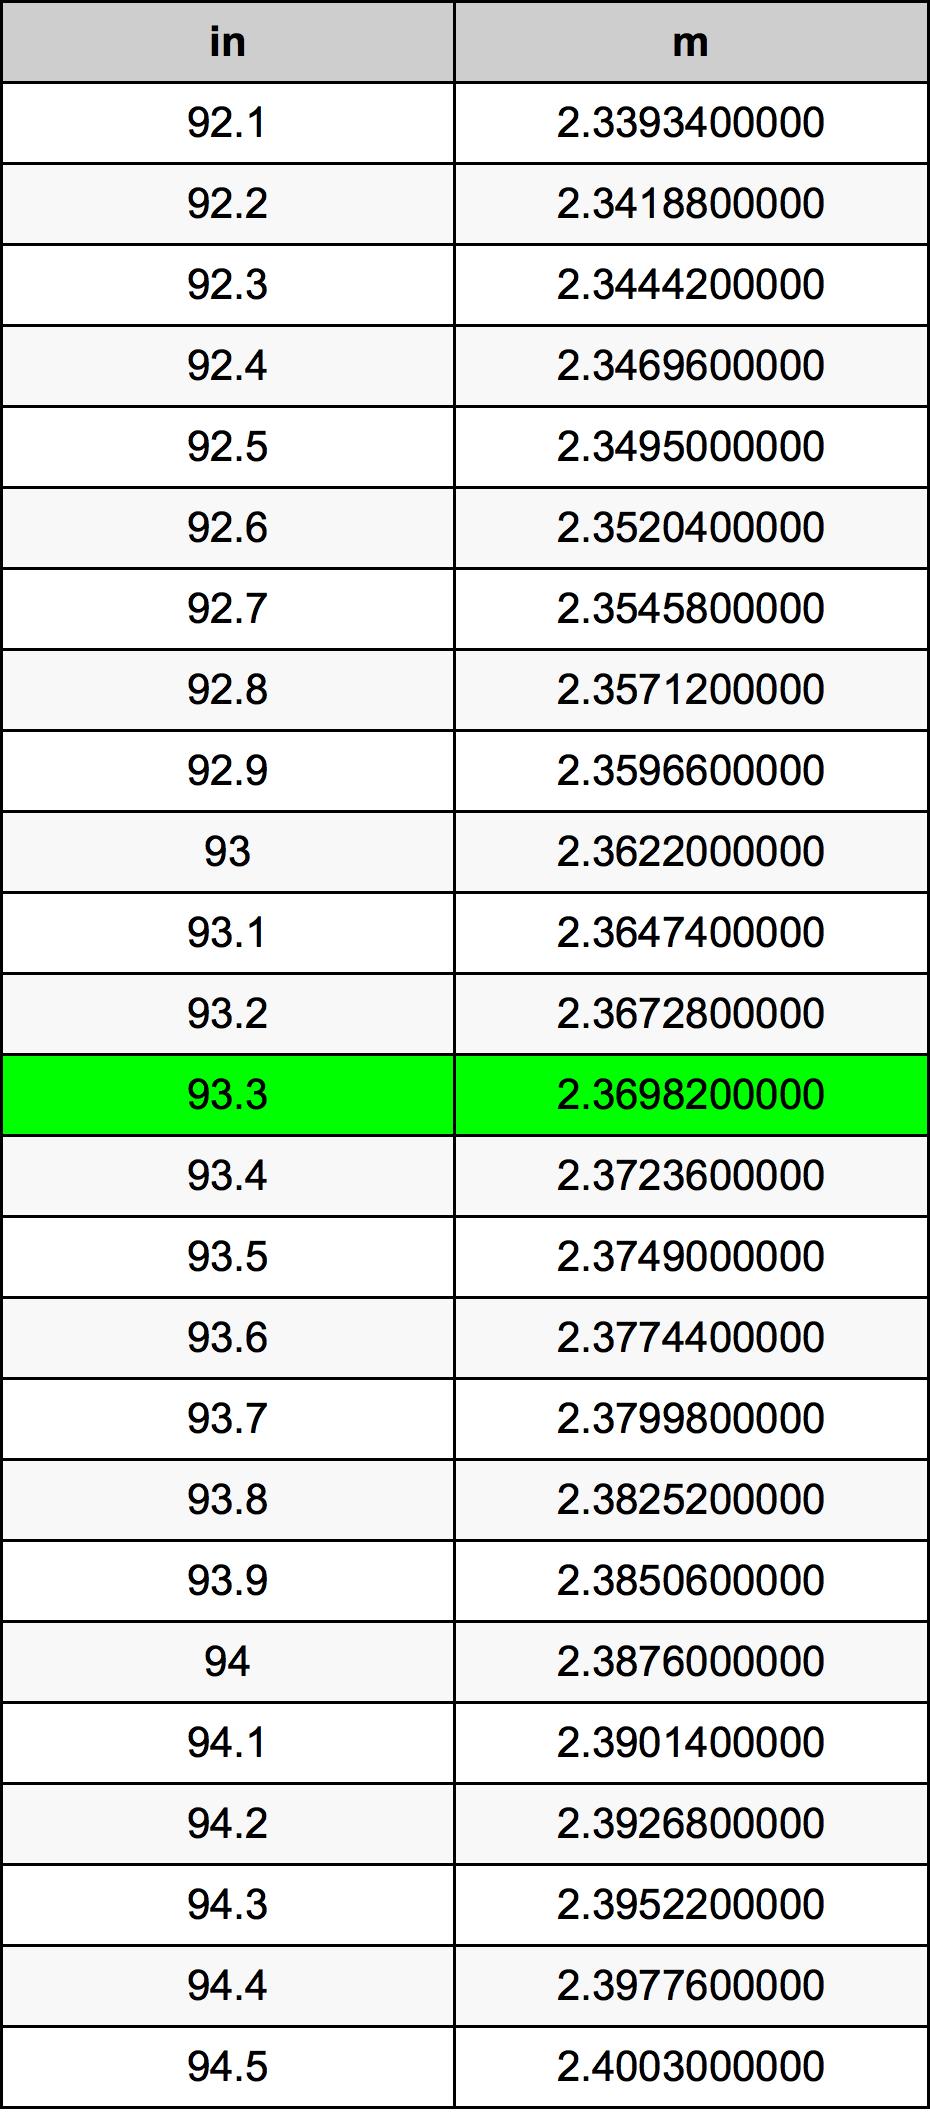 93.3 Inci konversi tabel